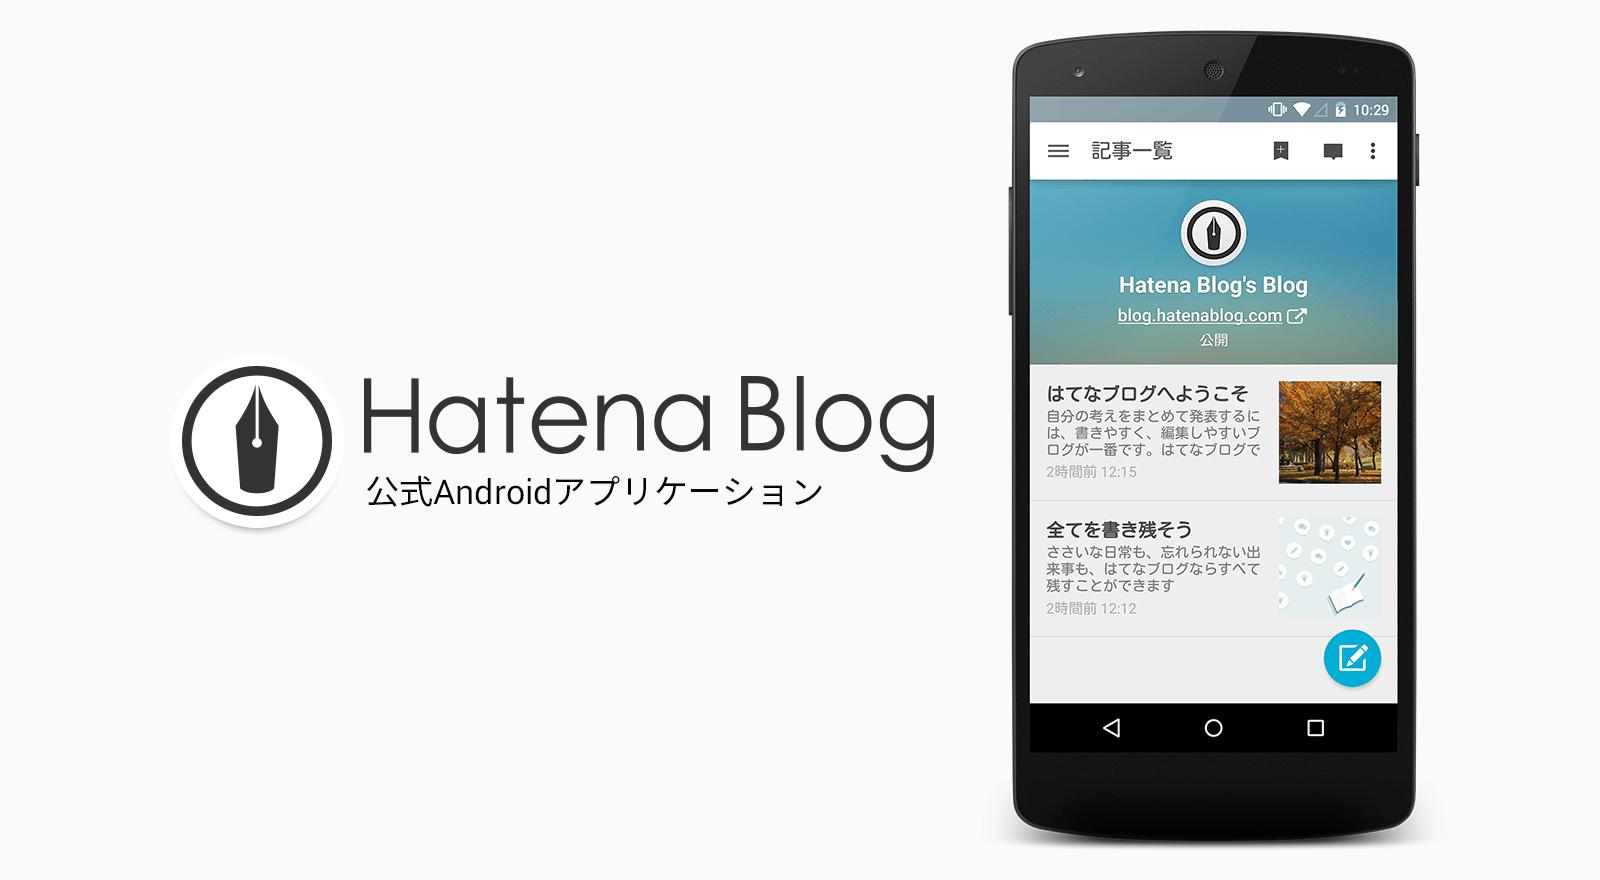 http://f.st-hatena.com/images/fotolife/h/hatenablog/20141029/20141029120401.png